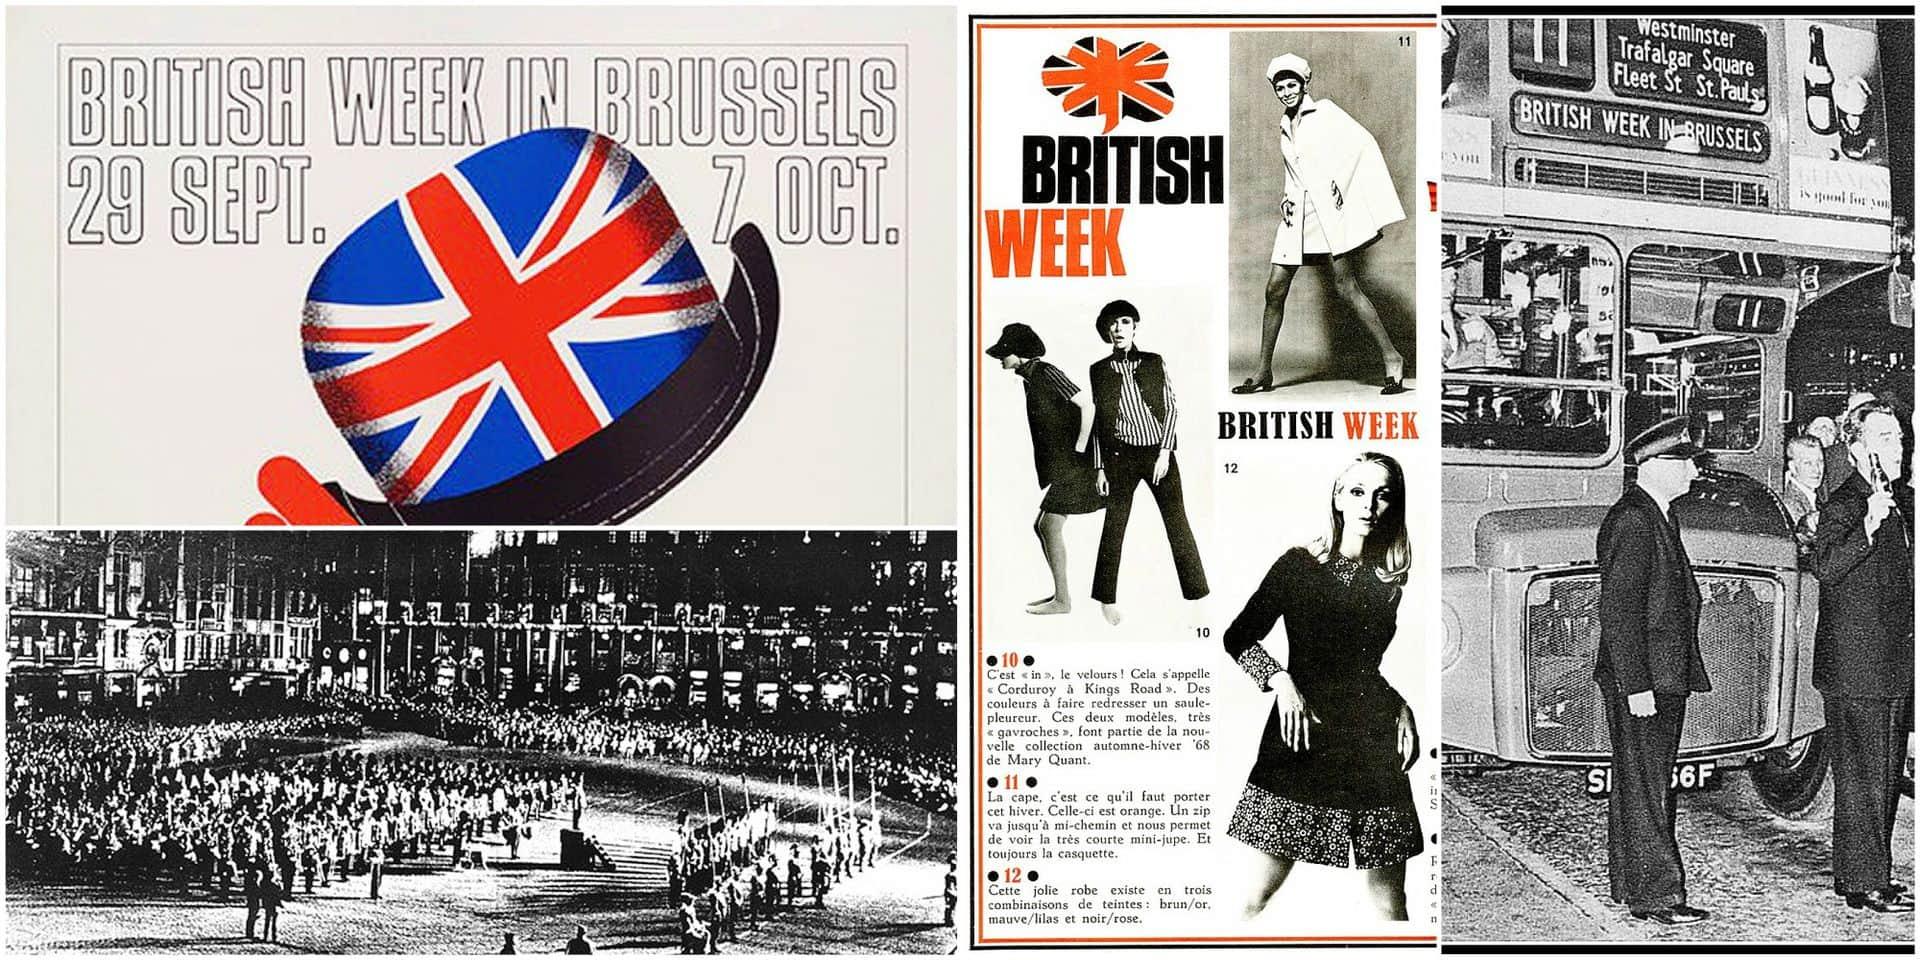 British Week 1967: quand l'Angleterre charmait l'Europe à Bruxelles